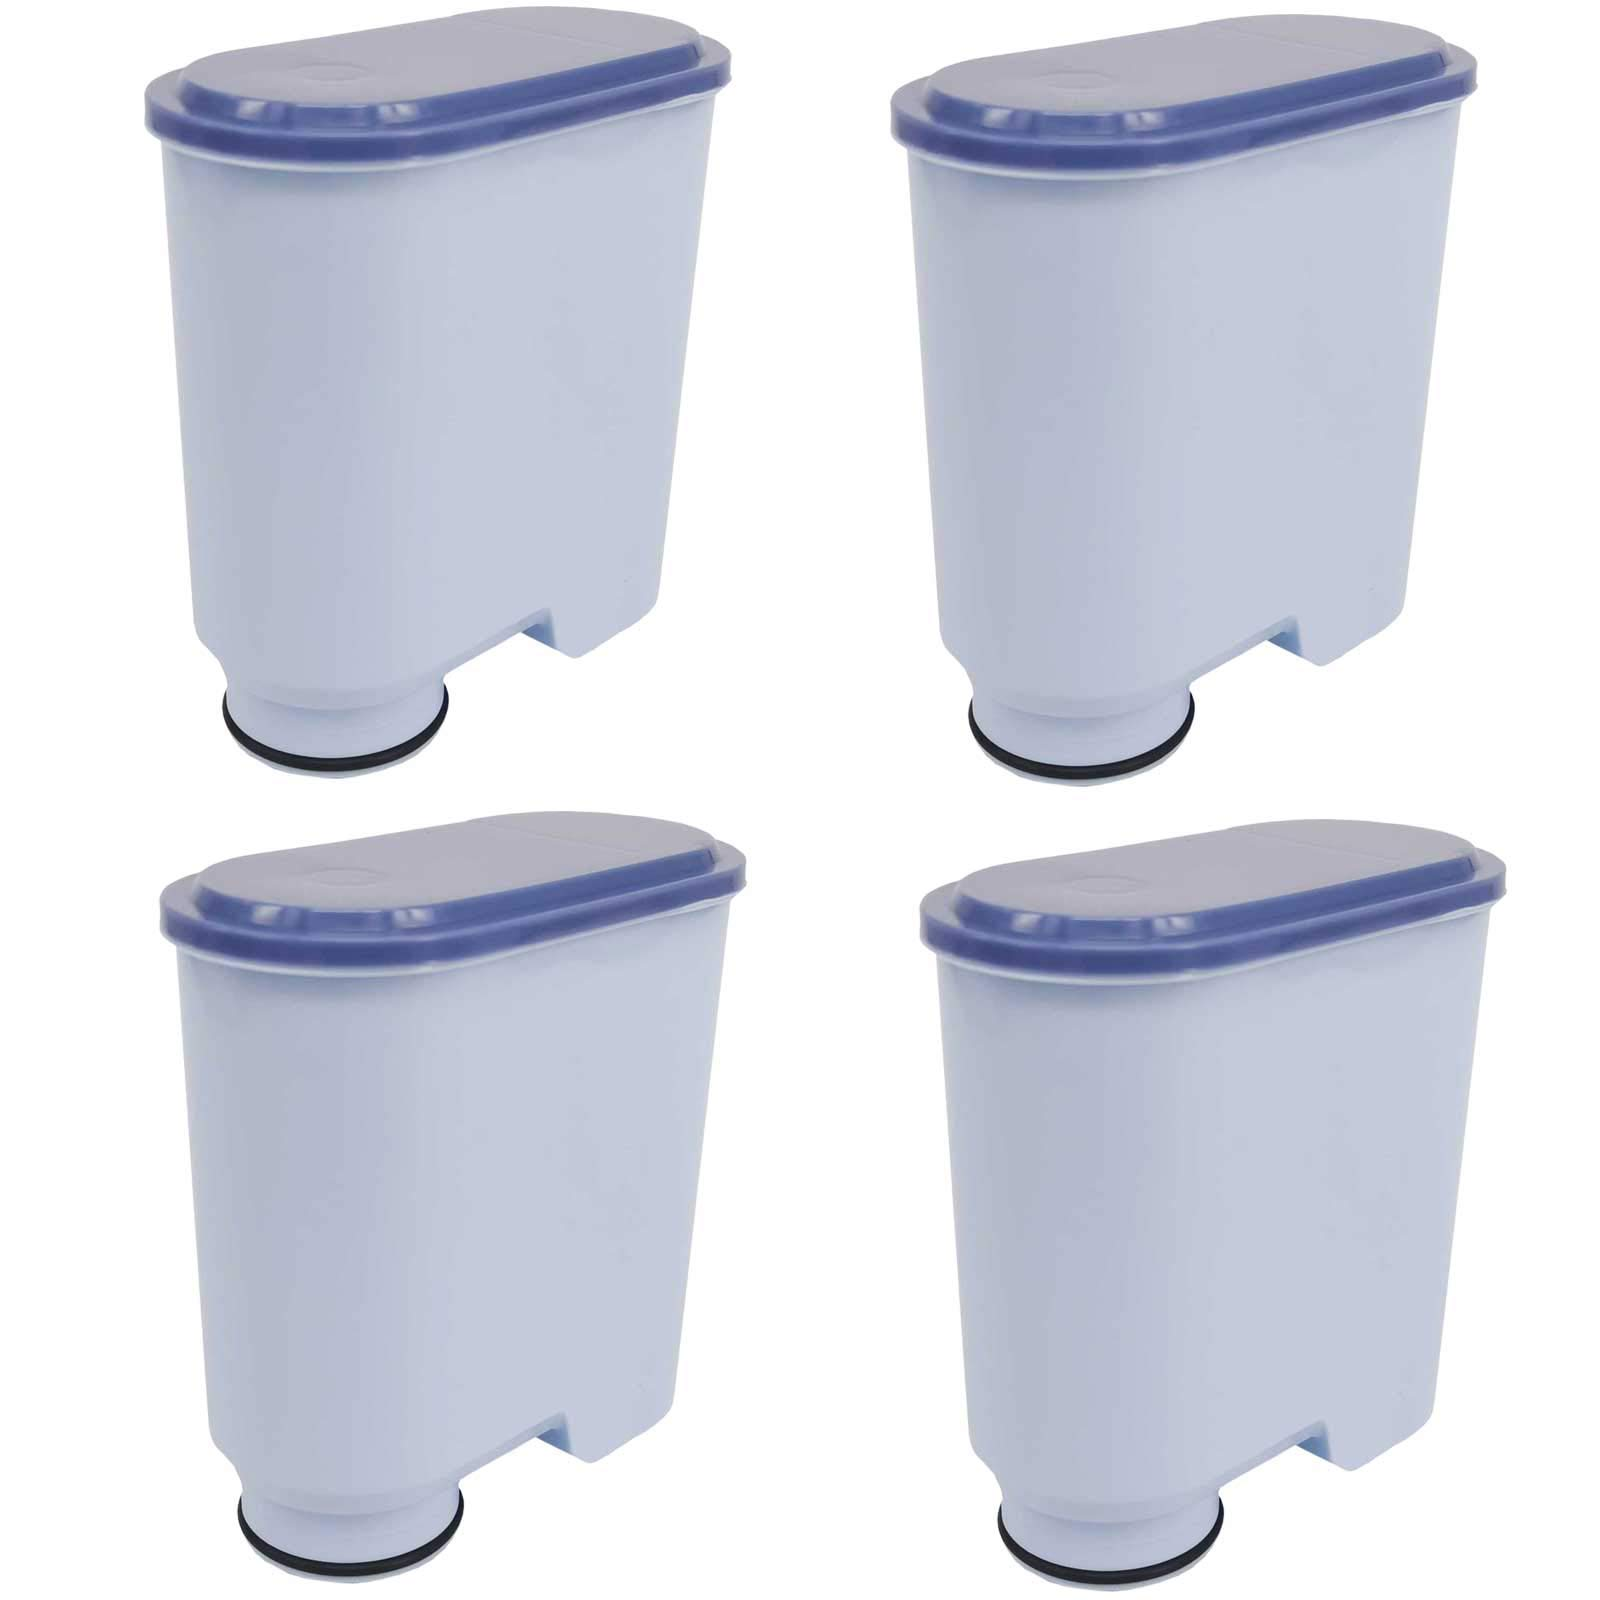 4 filtros de agua para cafetera automática Philips Saeco CA6707 CA6707/00 CA6707/10 CA6903/47 Aqua Clean 421946039401 421944050461: Amazon.es: Hogar